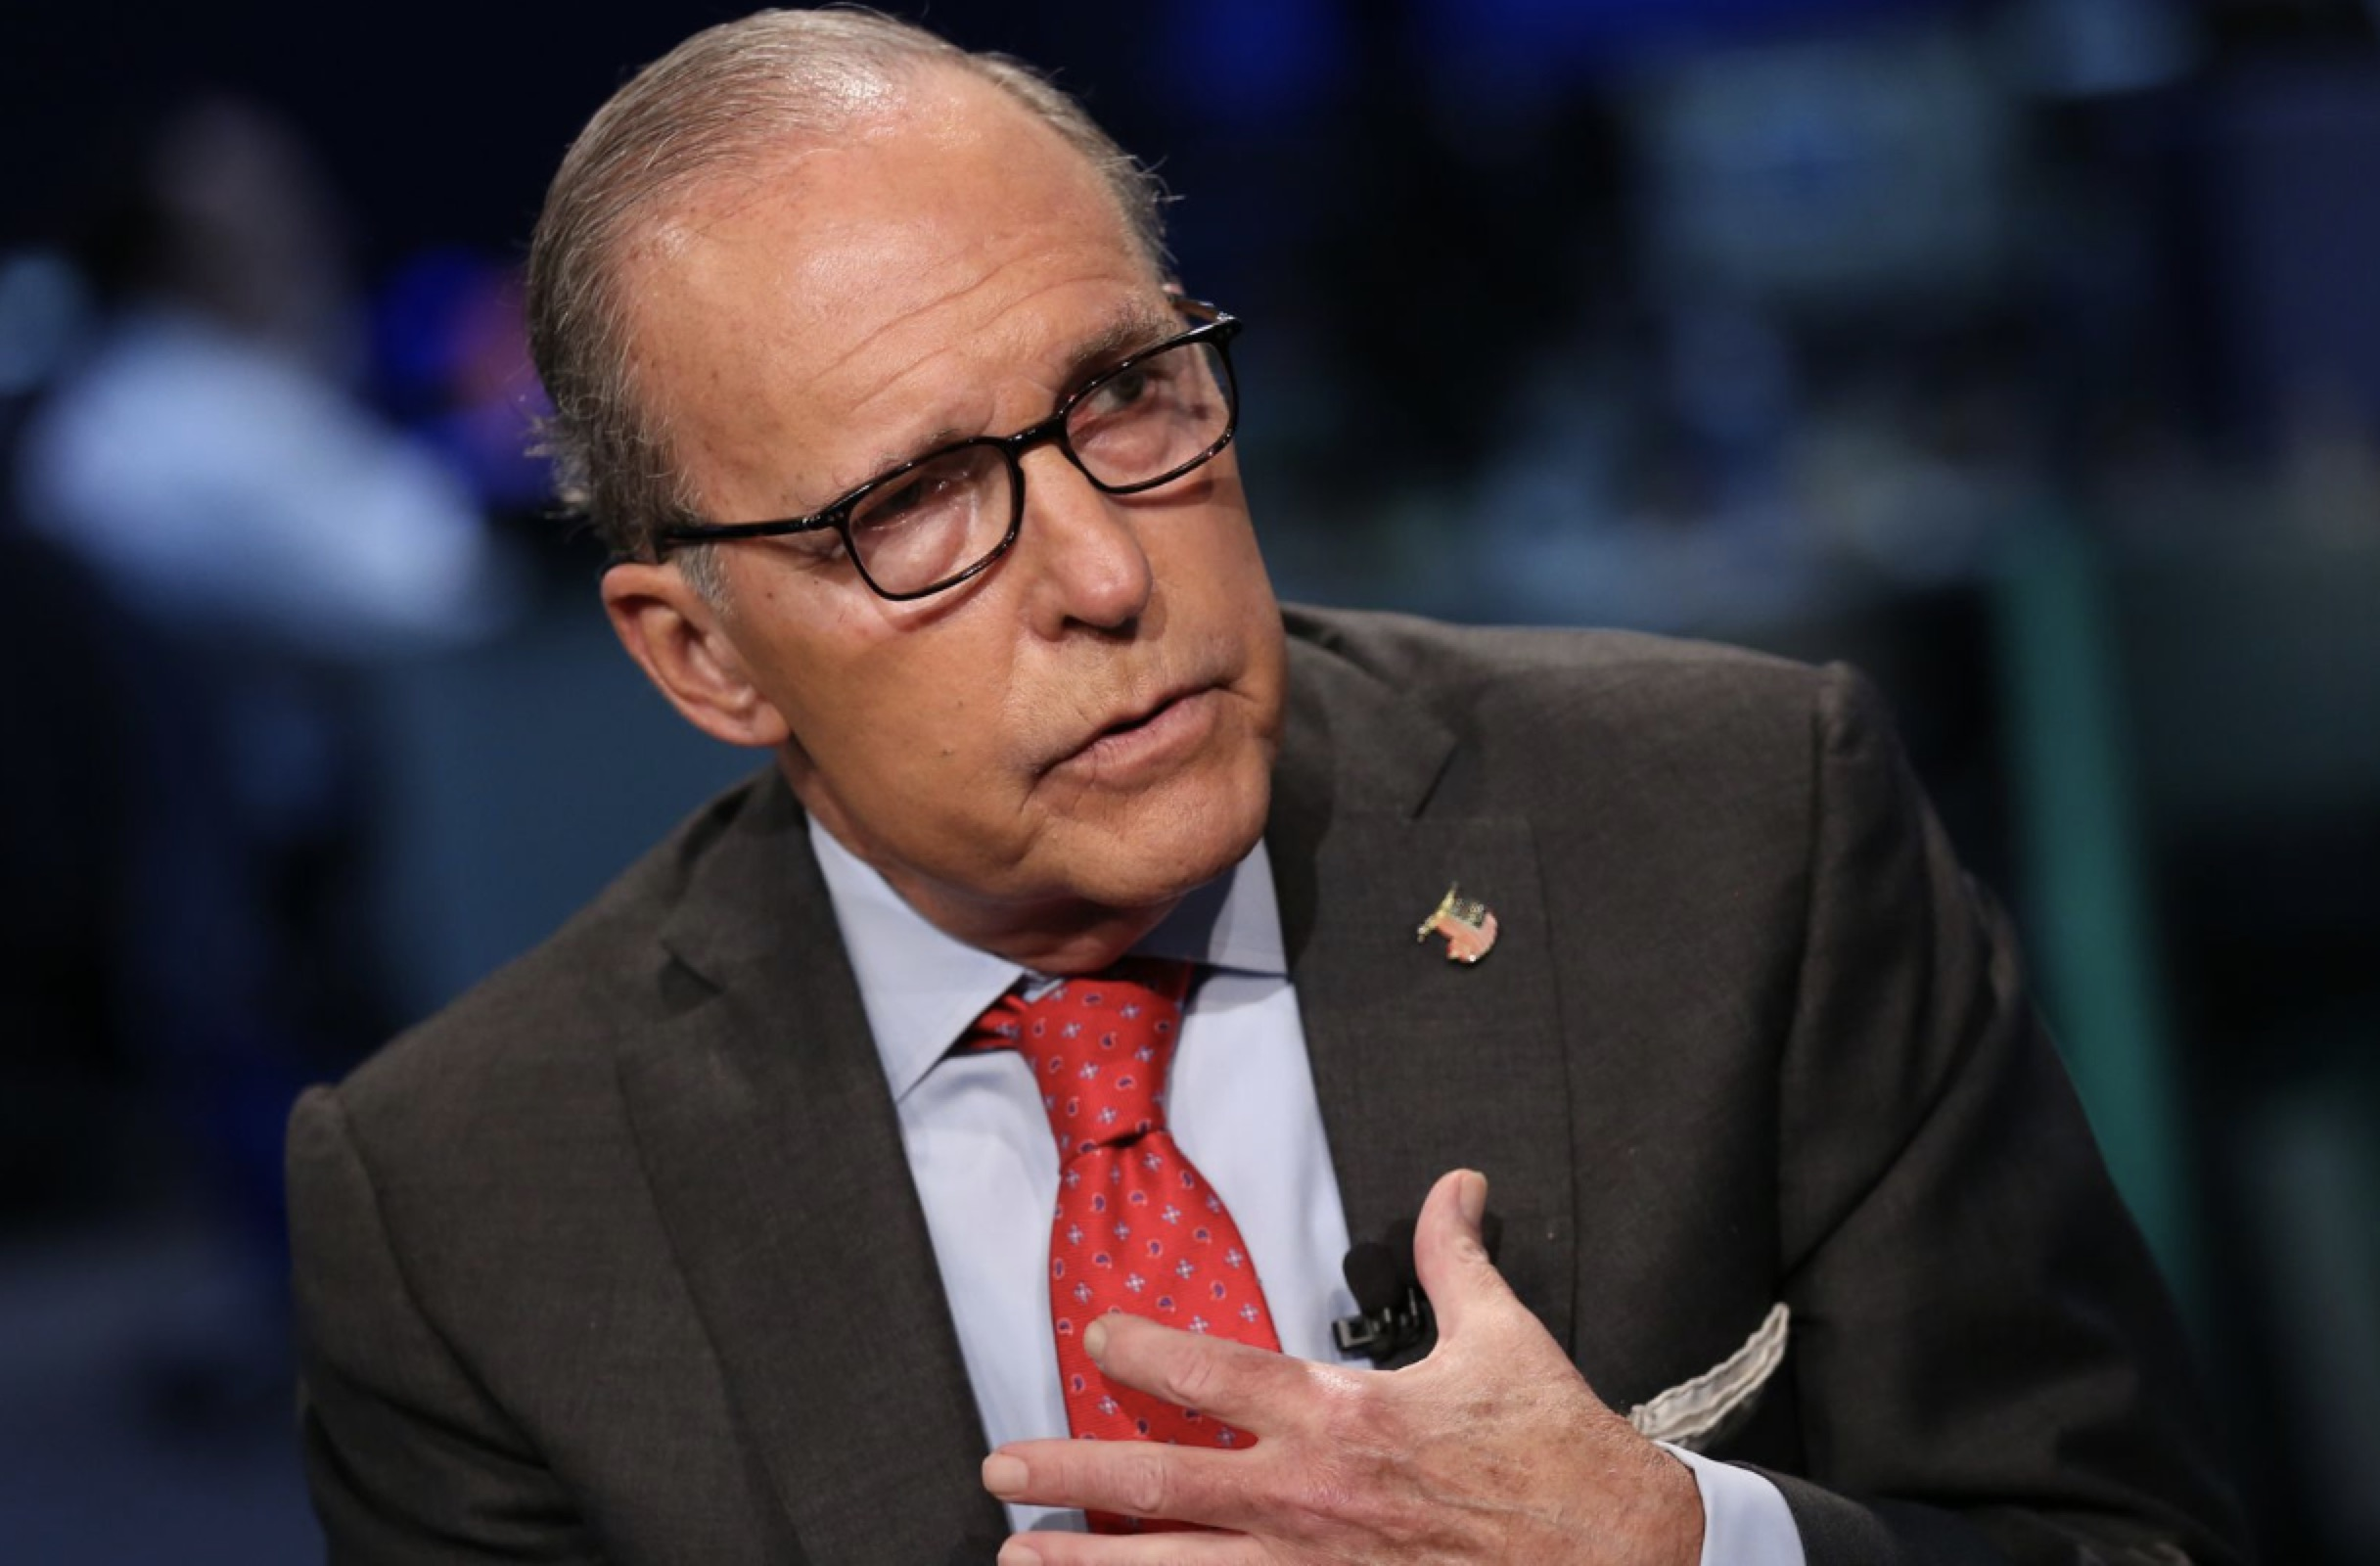 Trump's economic adviser Kudlow hospitalized after heart attack